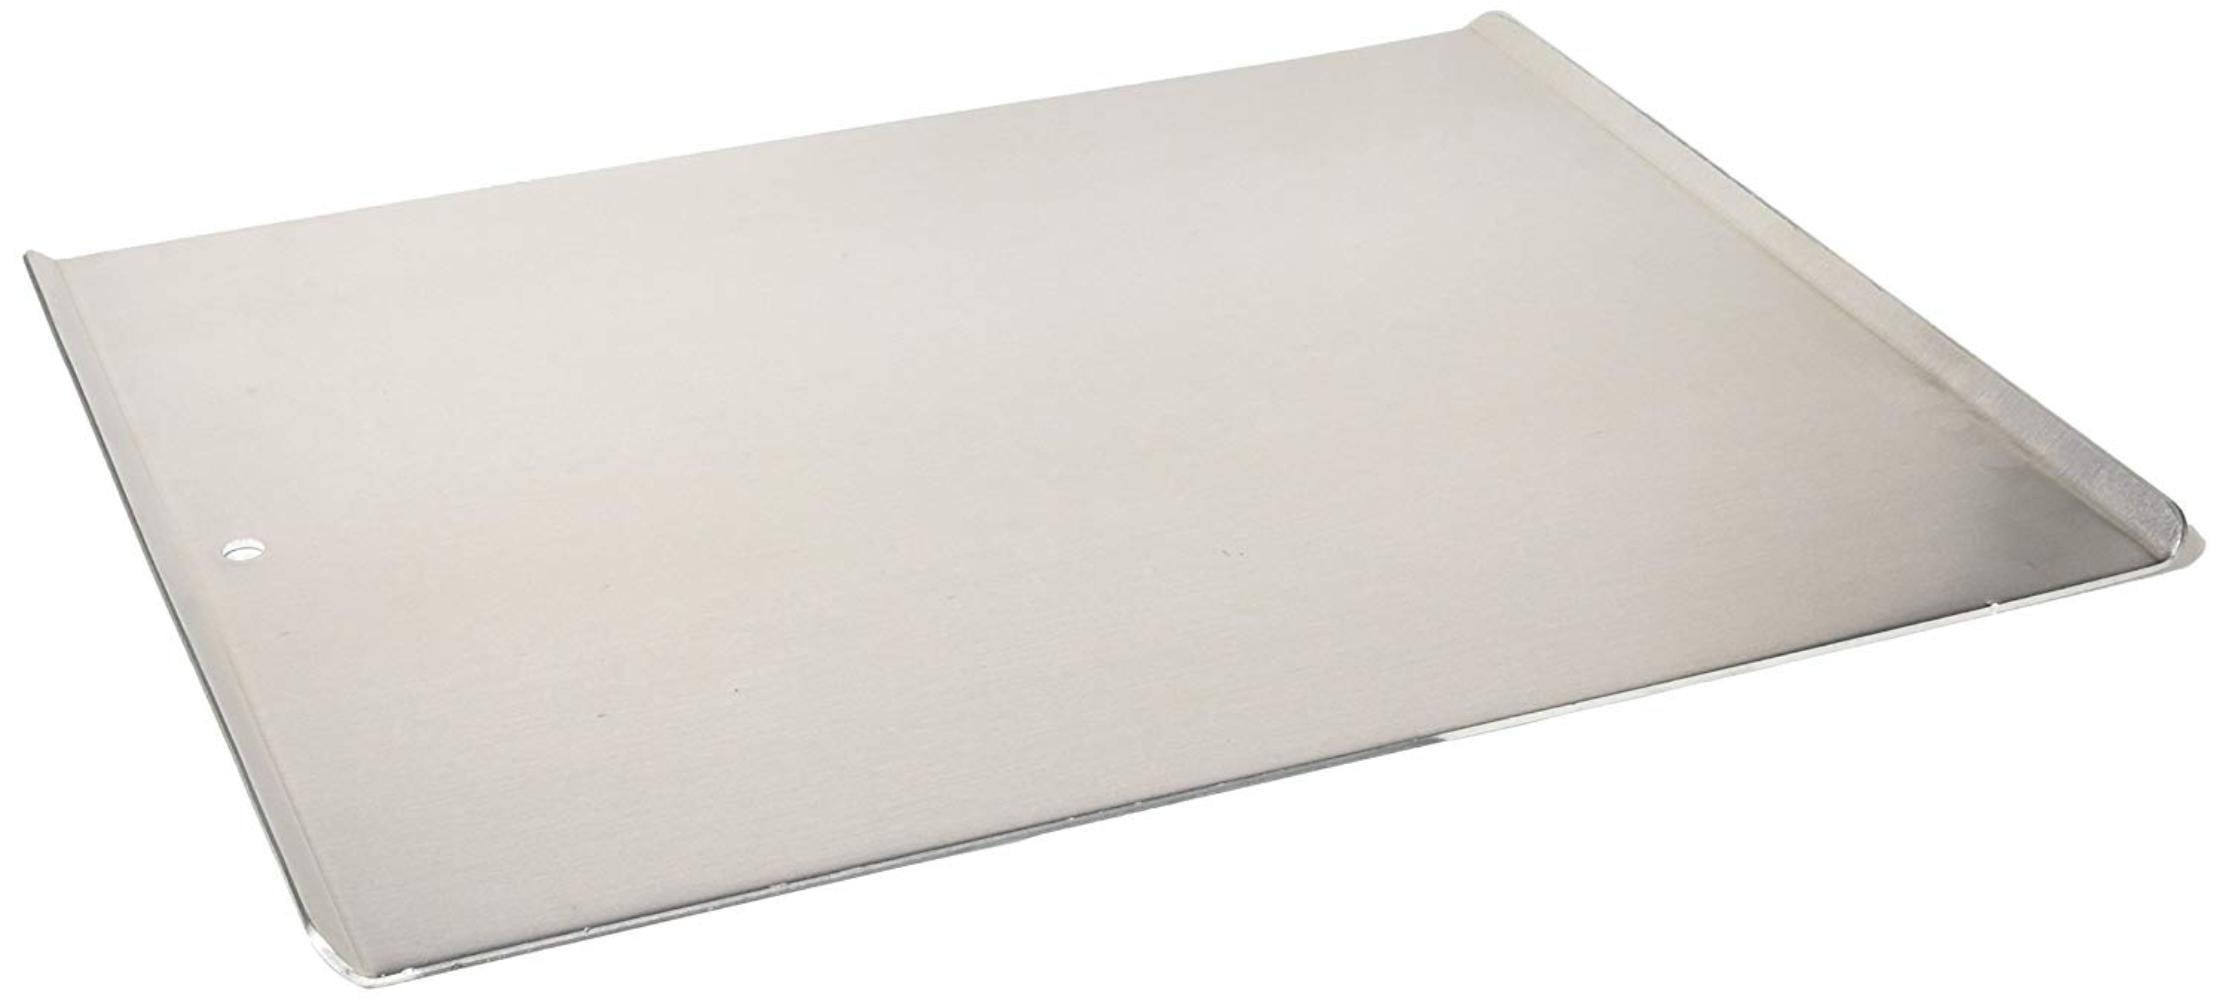 68085 Wear Ever Cookie Sheet Pan 17 Inch X 14 Inch